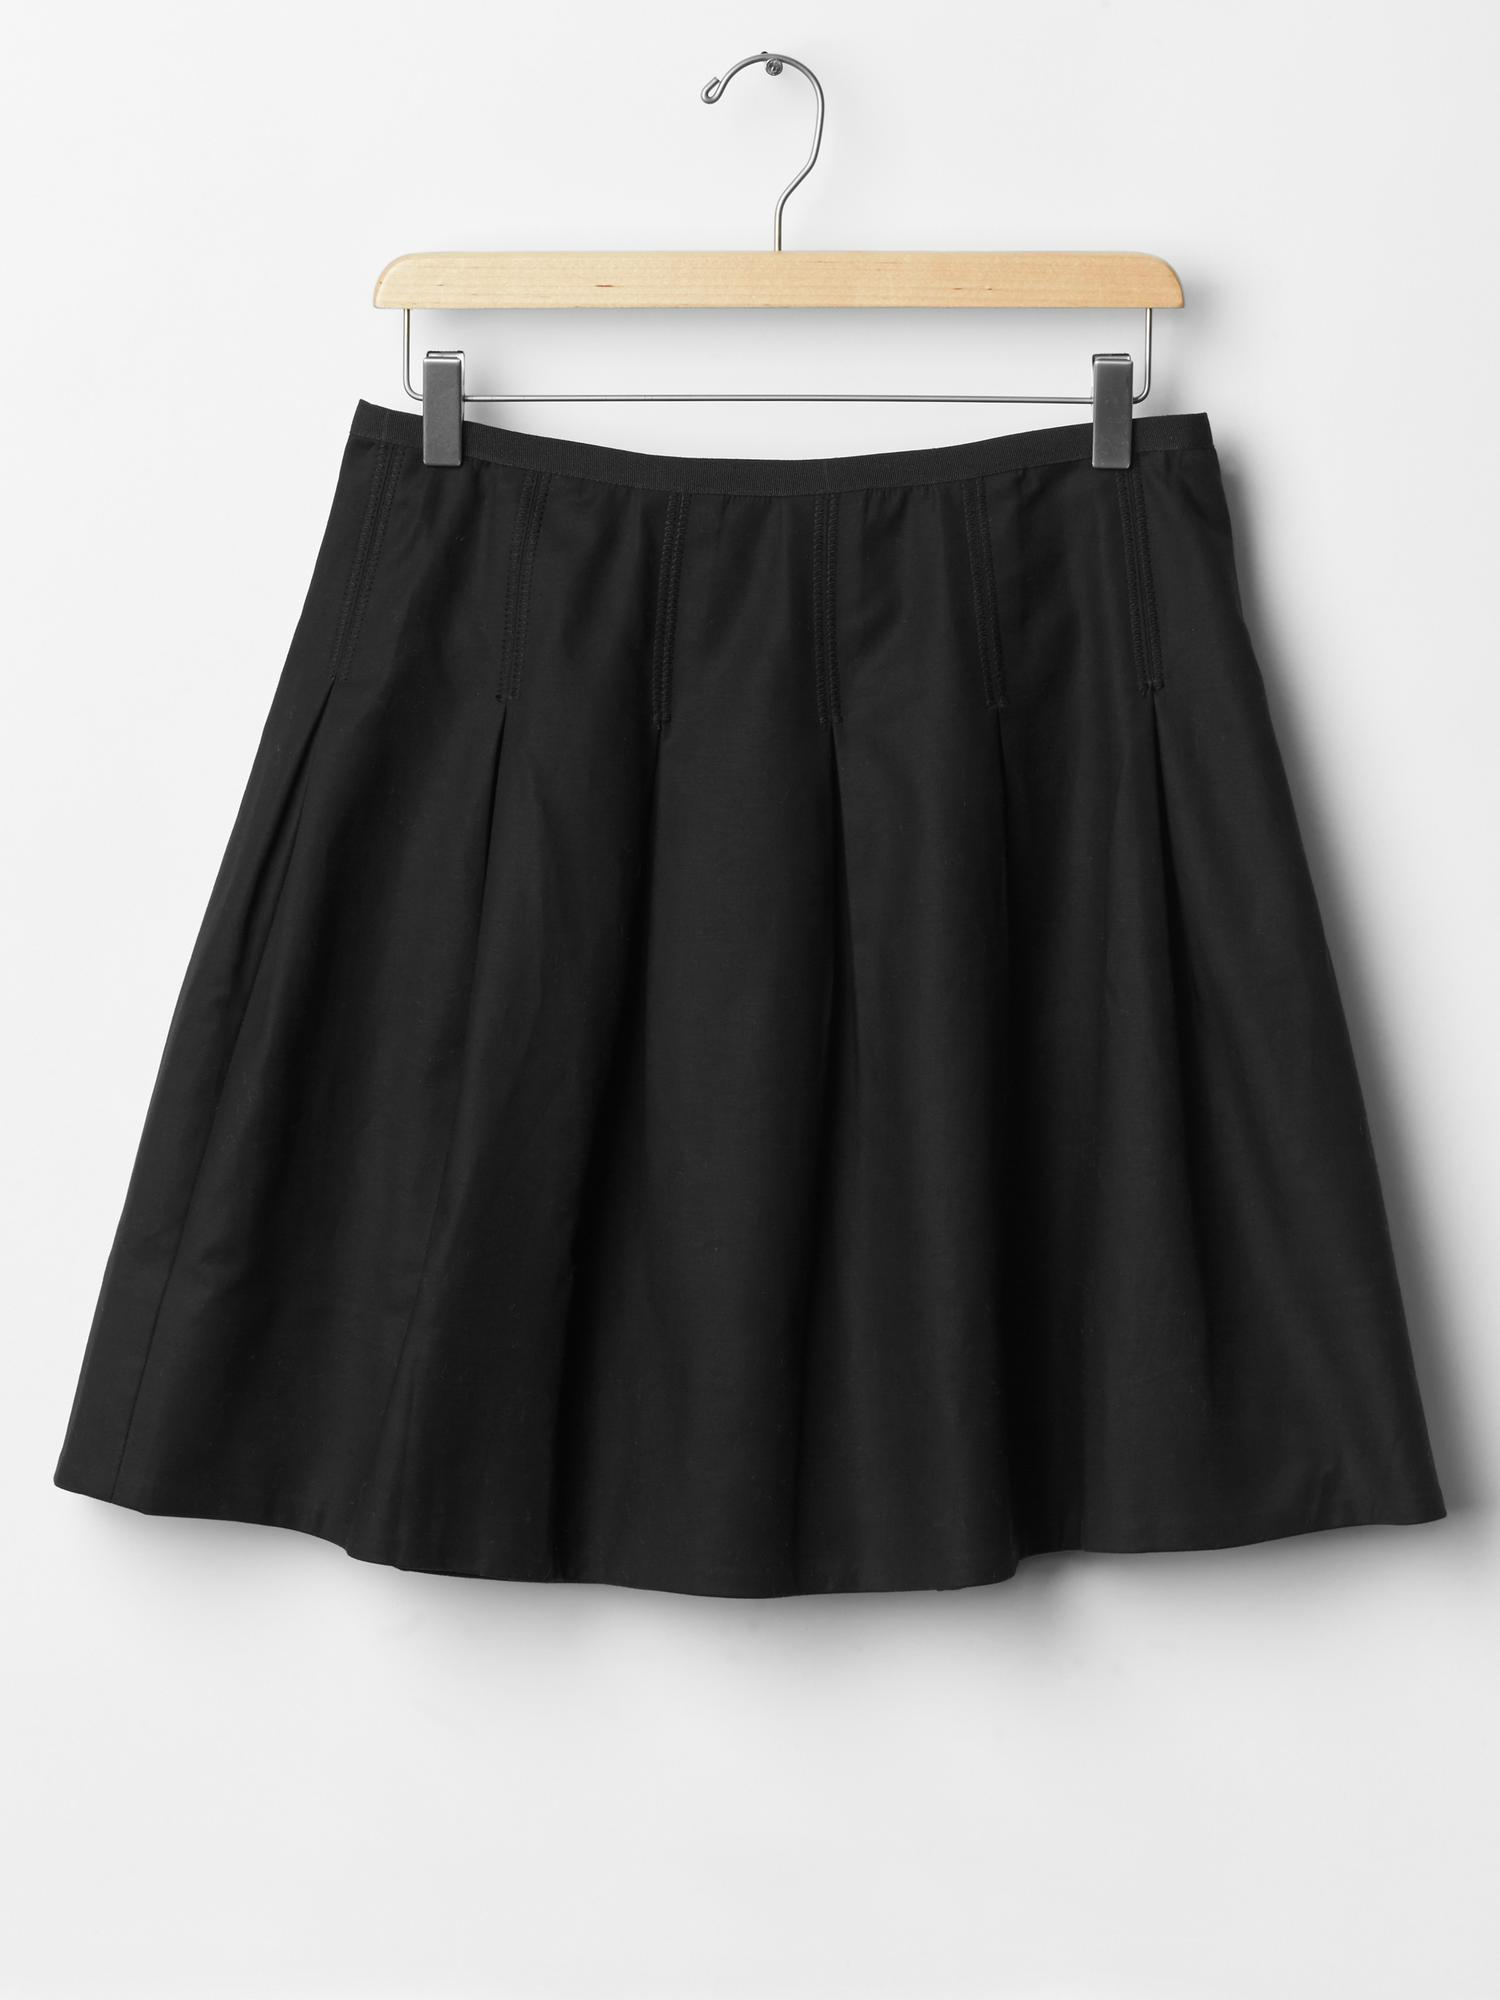 gap pleated skirt in black true black lyst